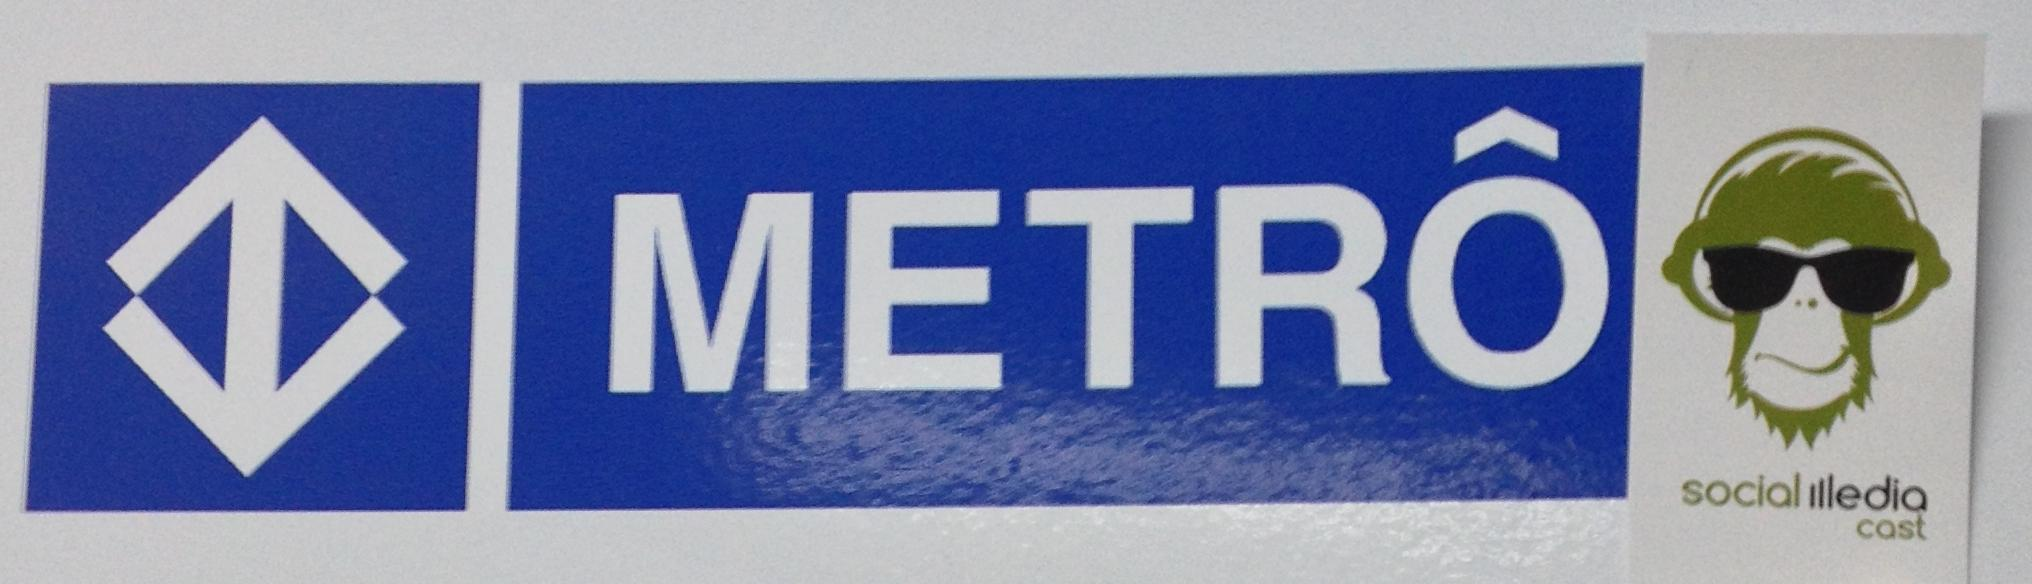 MetroSP3